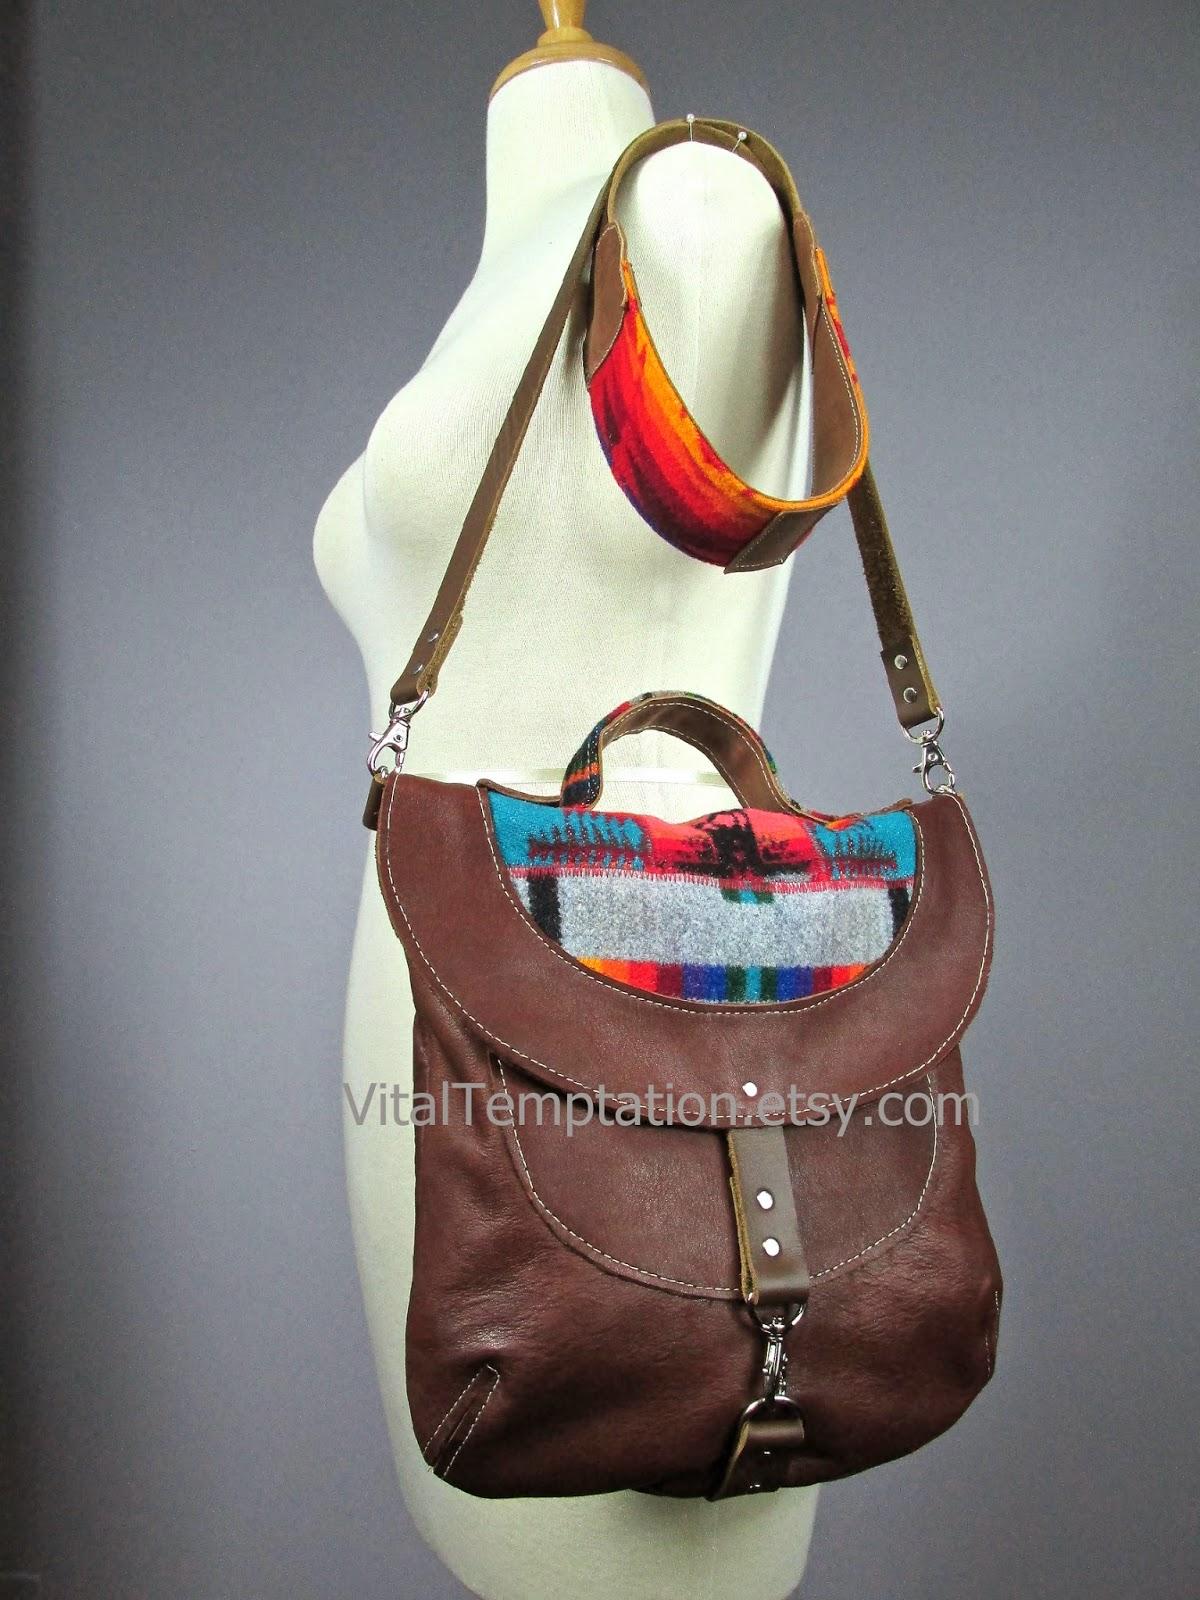 c6c6f50558 Laboratory of Fashion  Leather cross body bag with Pendleton wool ...